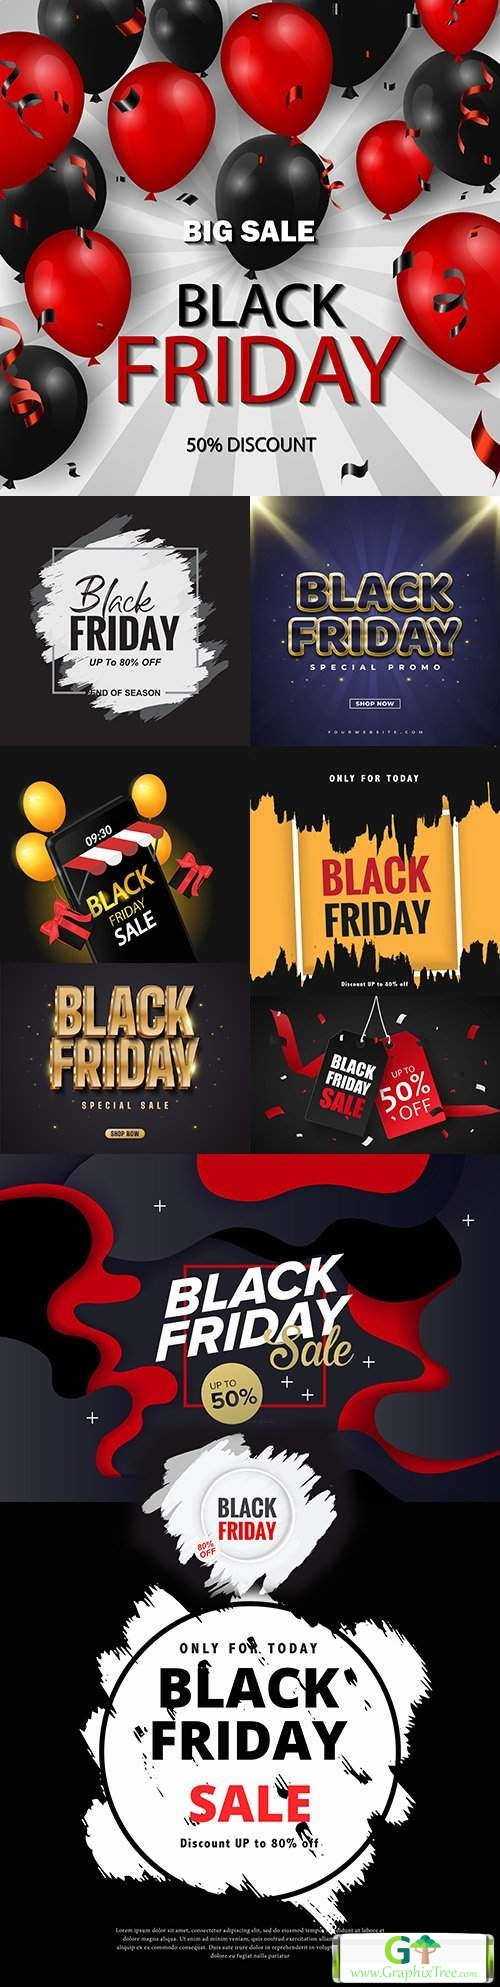 Black Friday and sale special design illustration 30